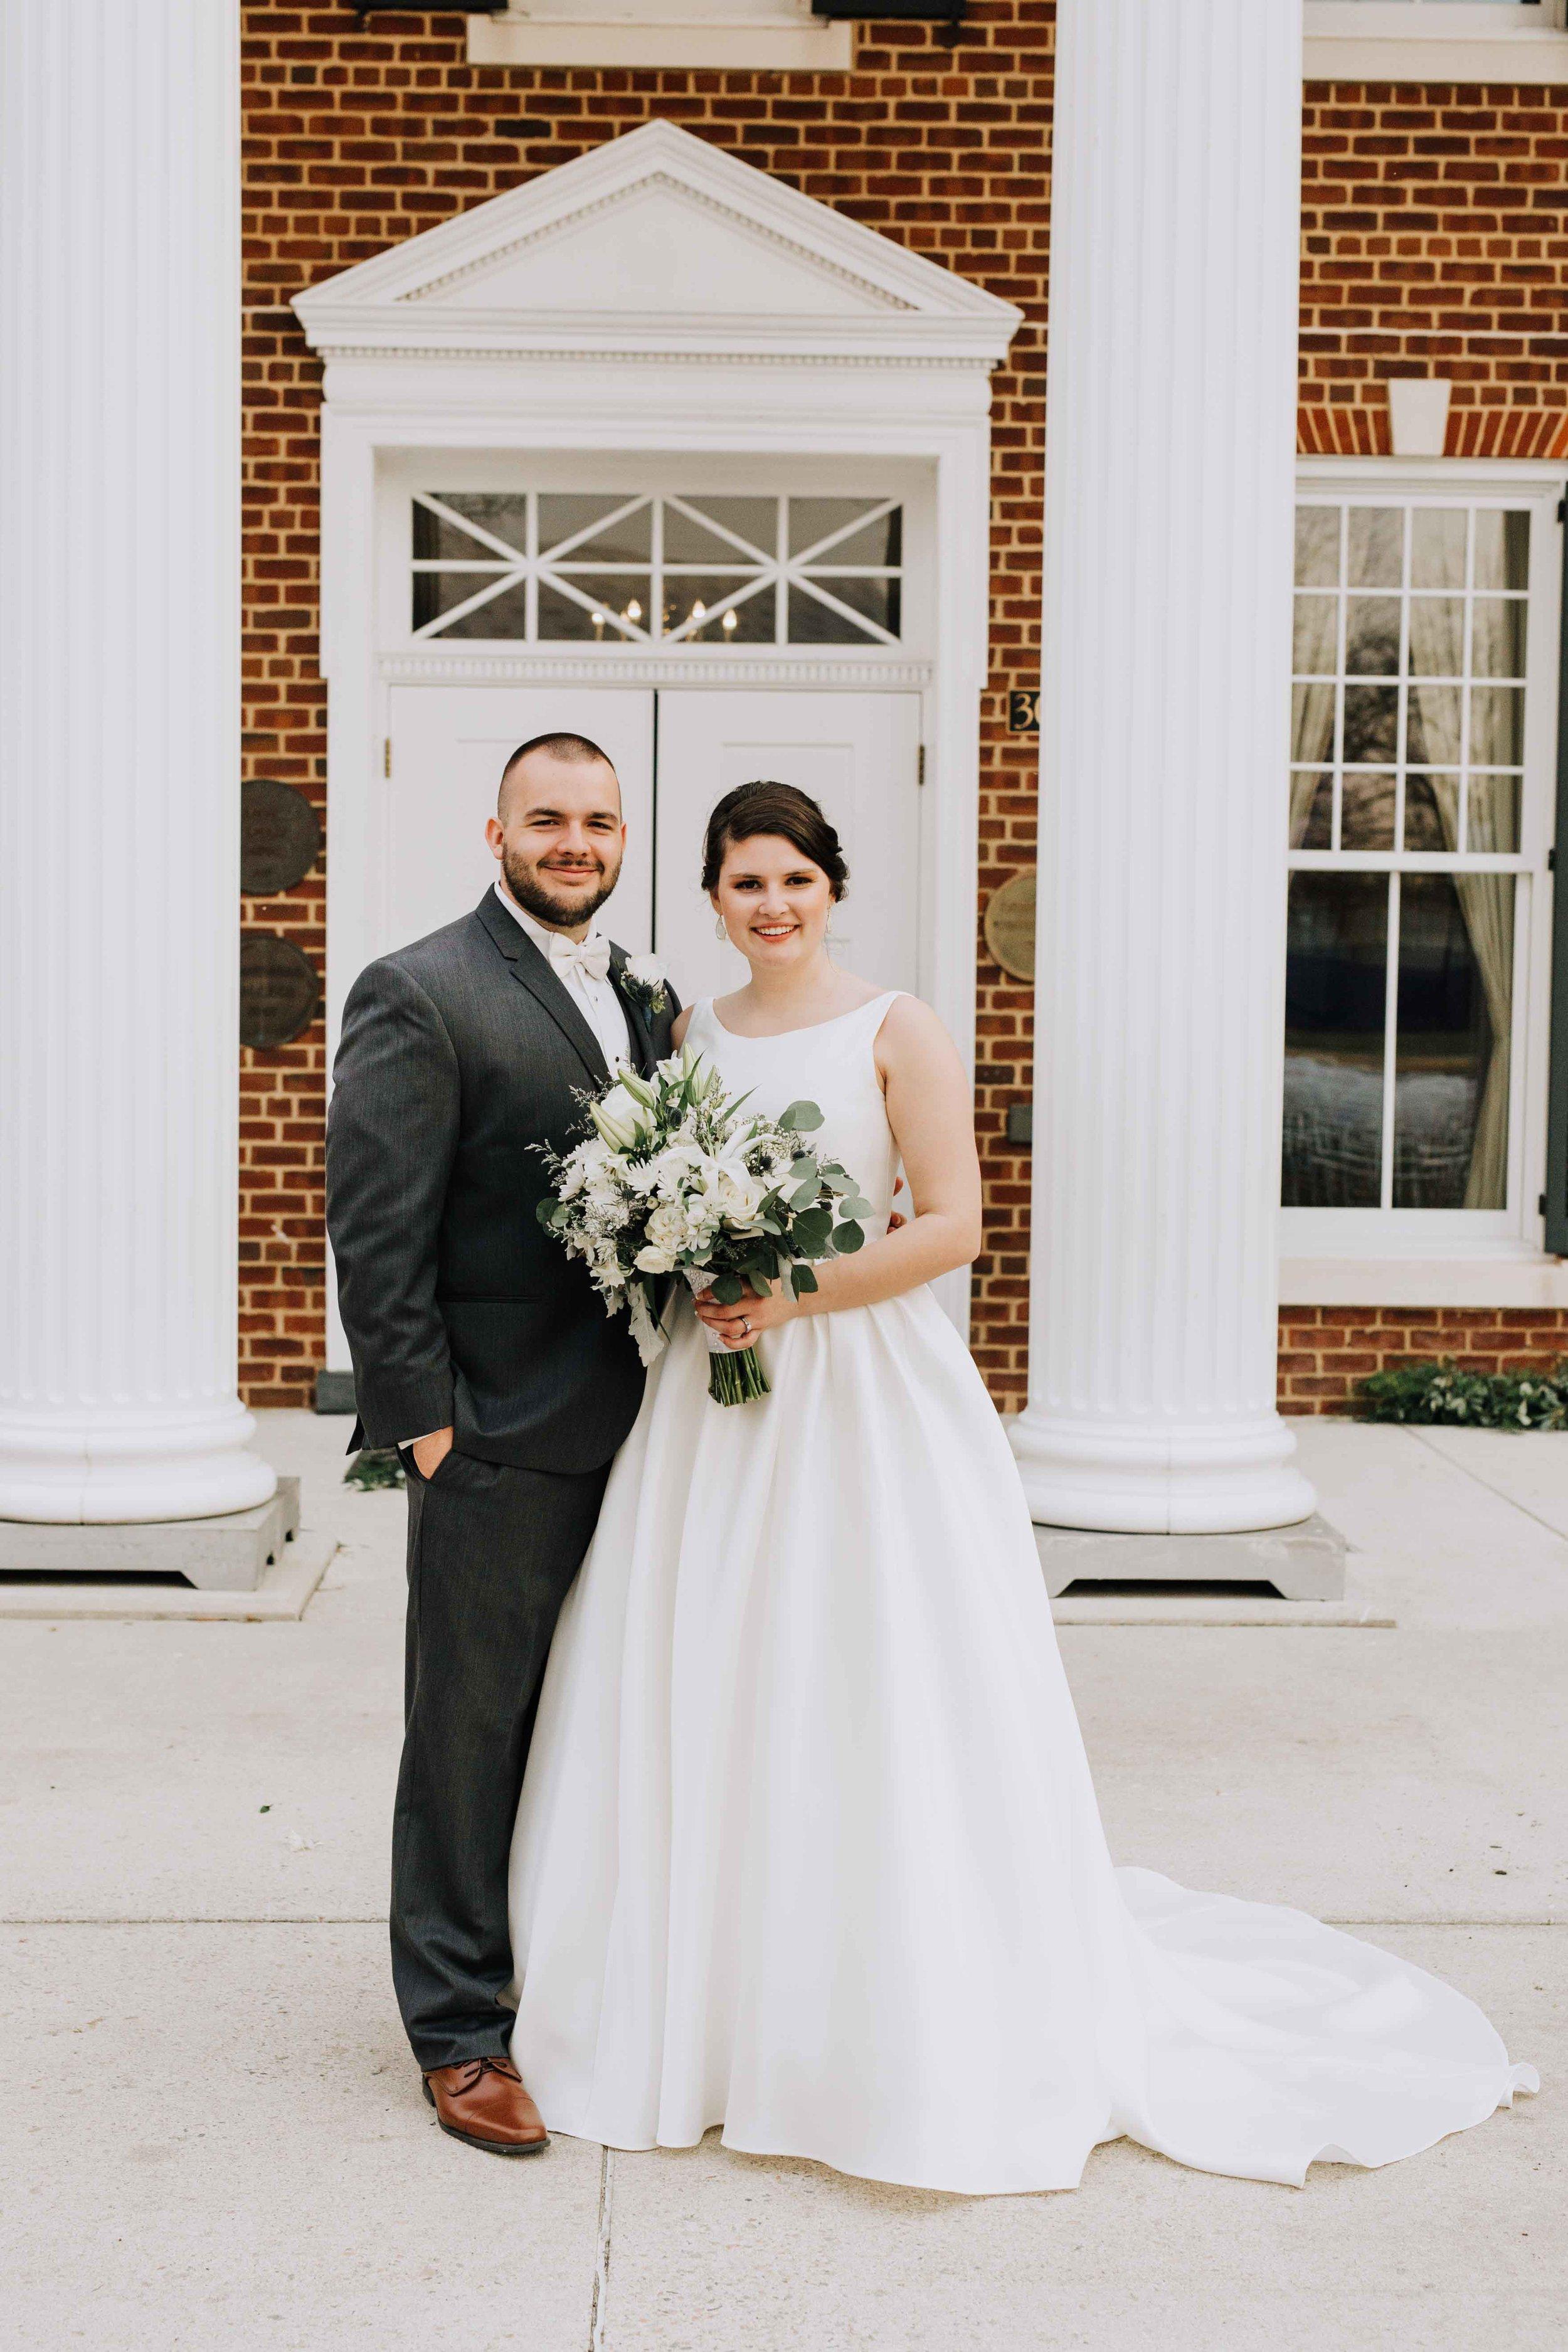 Farmville-Virginia-Wedding-Hotel-Weynoke-Downtown-Jacqueline-Waters-Photography-Detailed- (1296).jpg